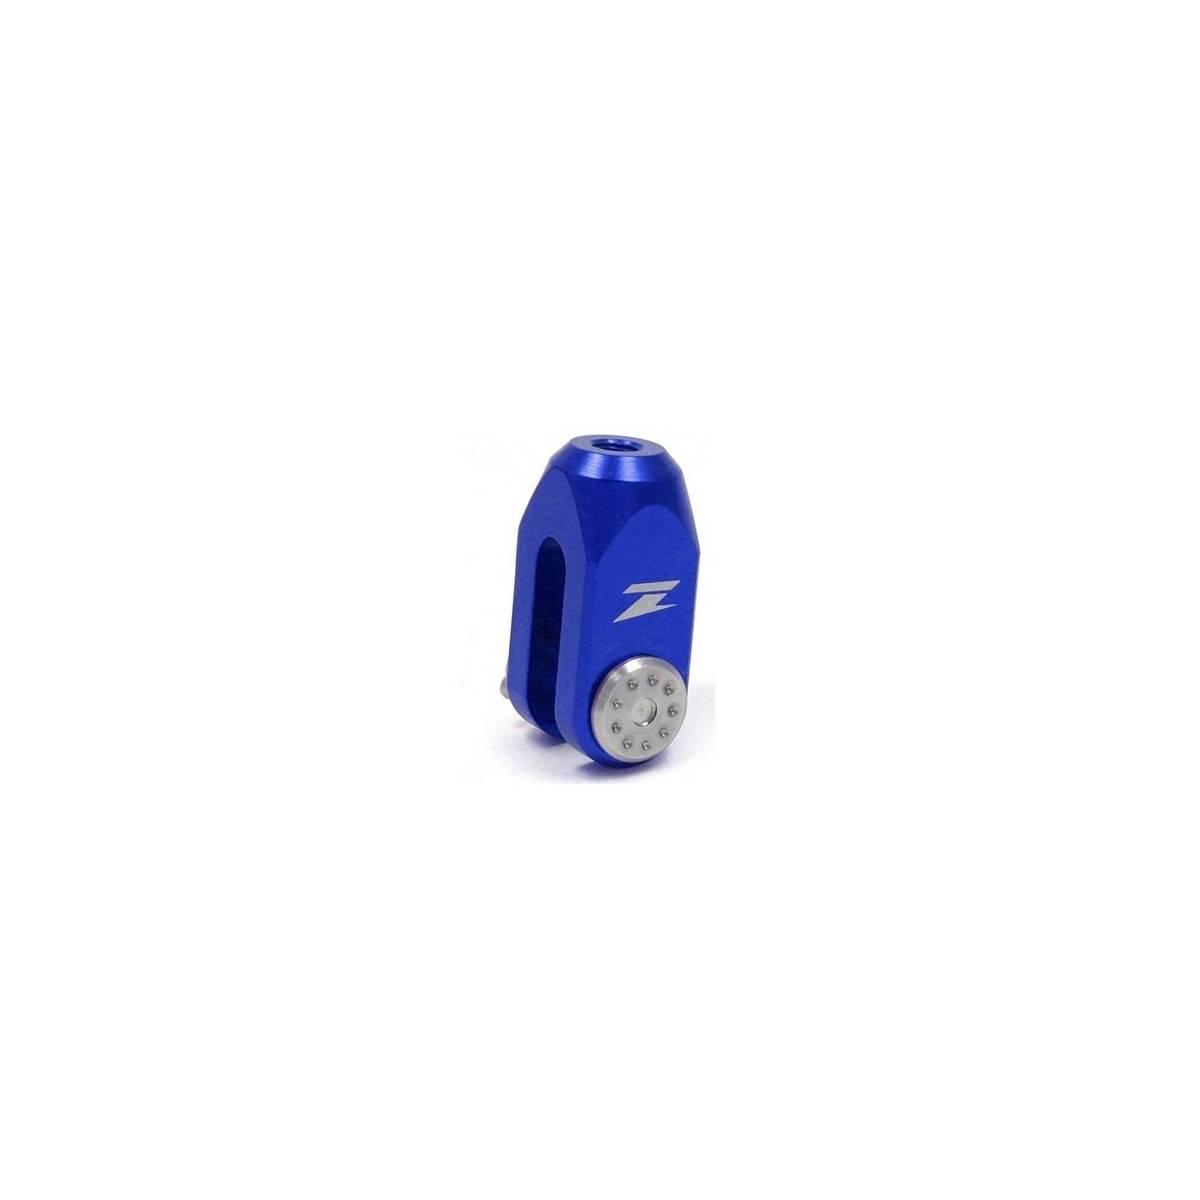 ZE94.0622 - Leva Cable Embrague Zeta Yz250F 450F´14-Azul